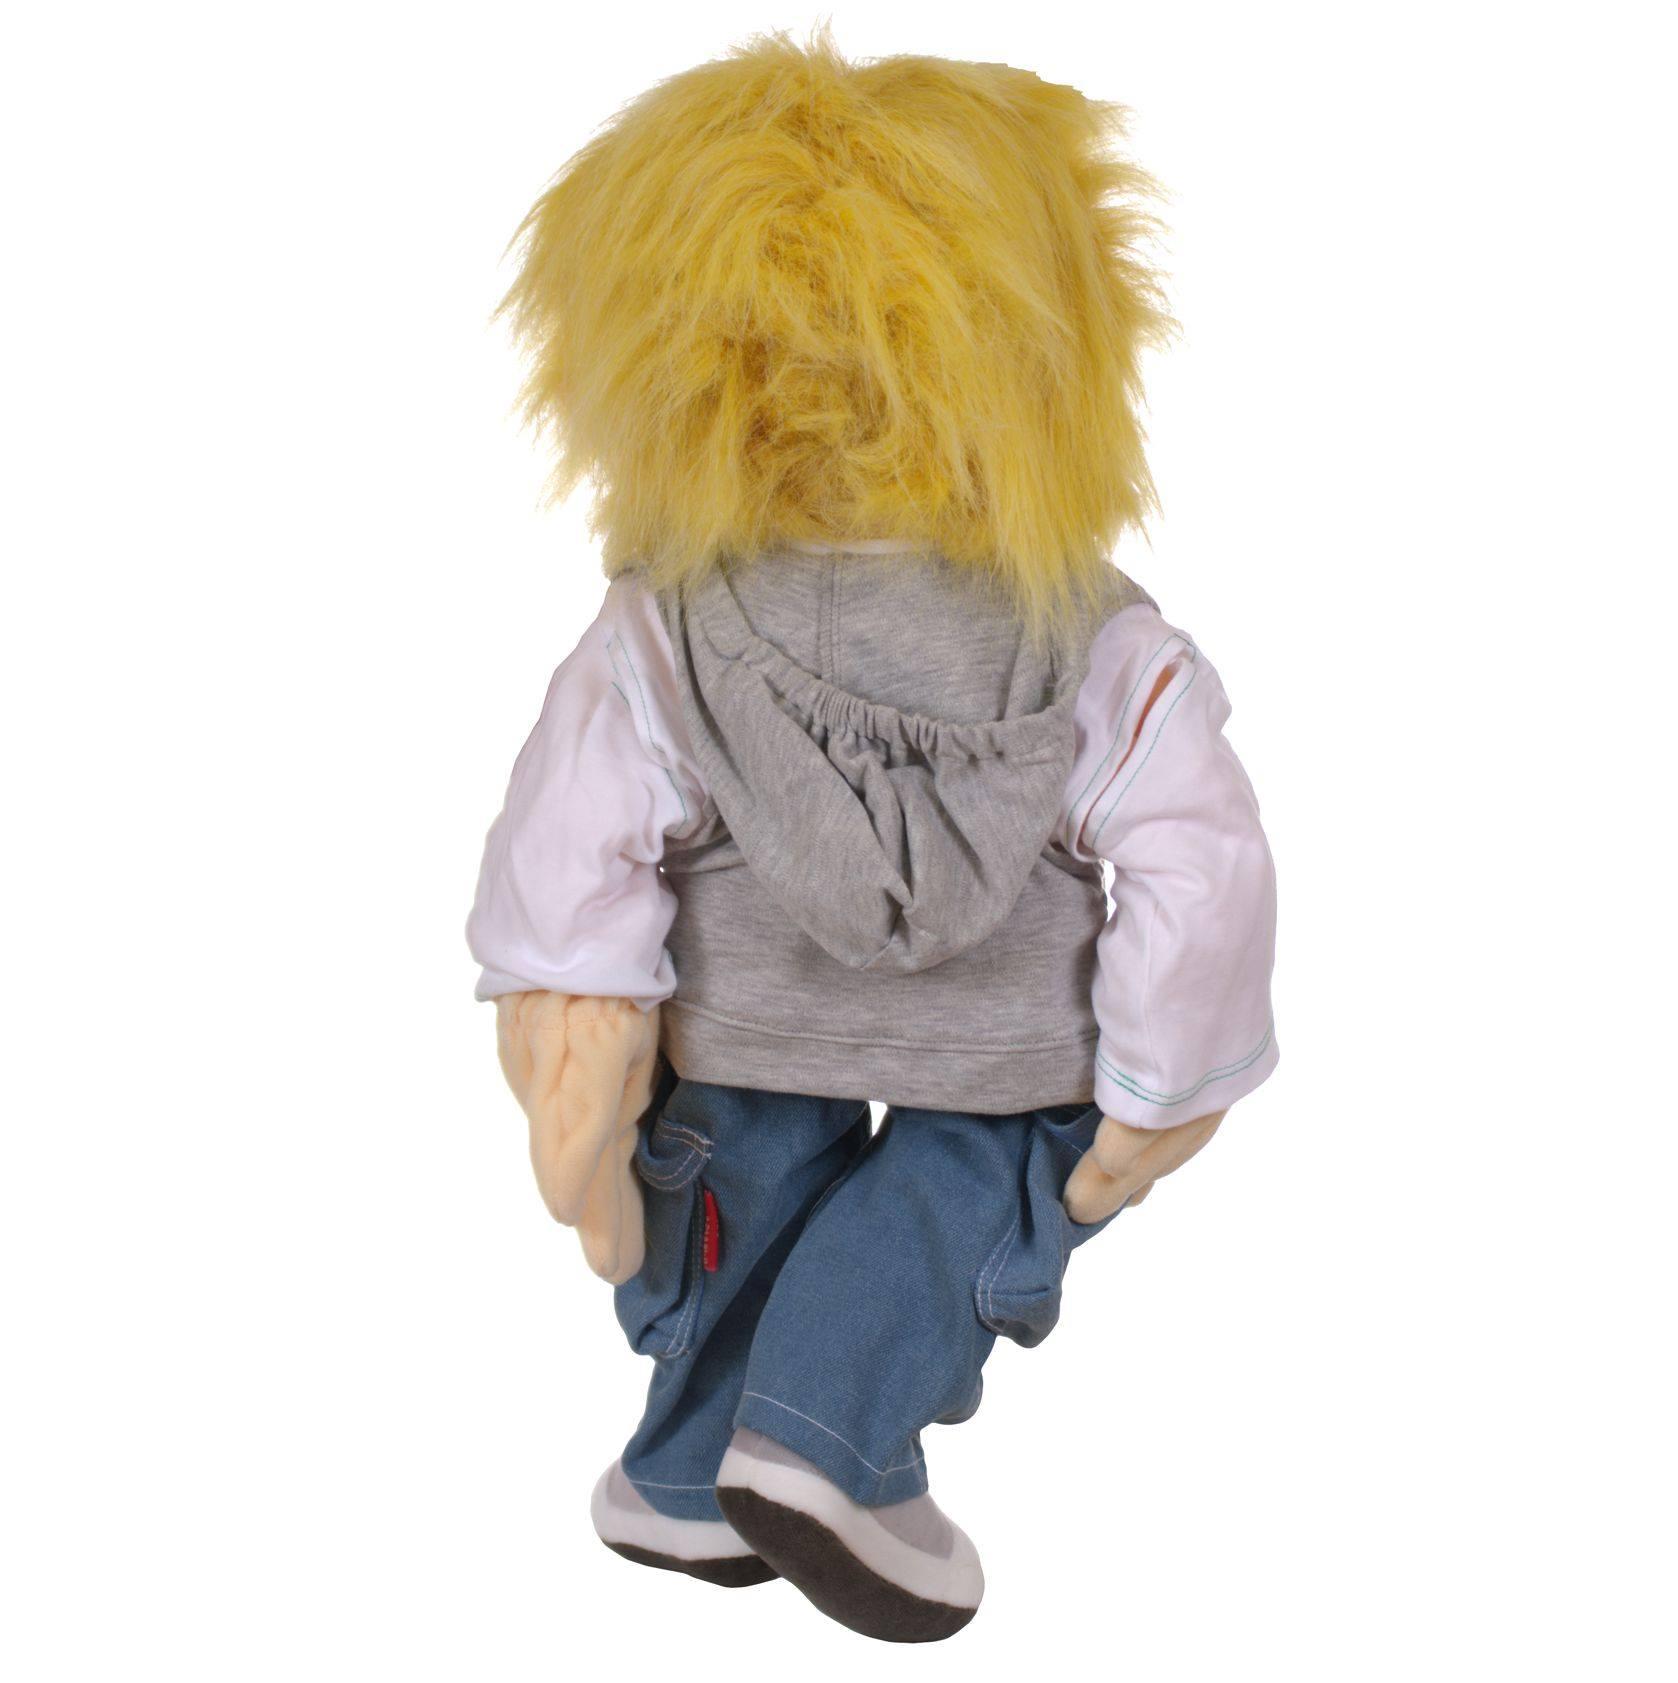 Living Puppets Handpuppe Joost 65 cm W644